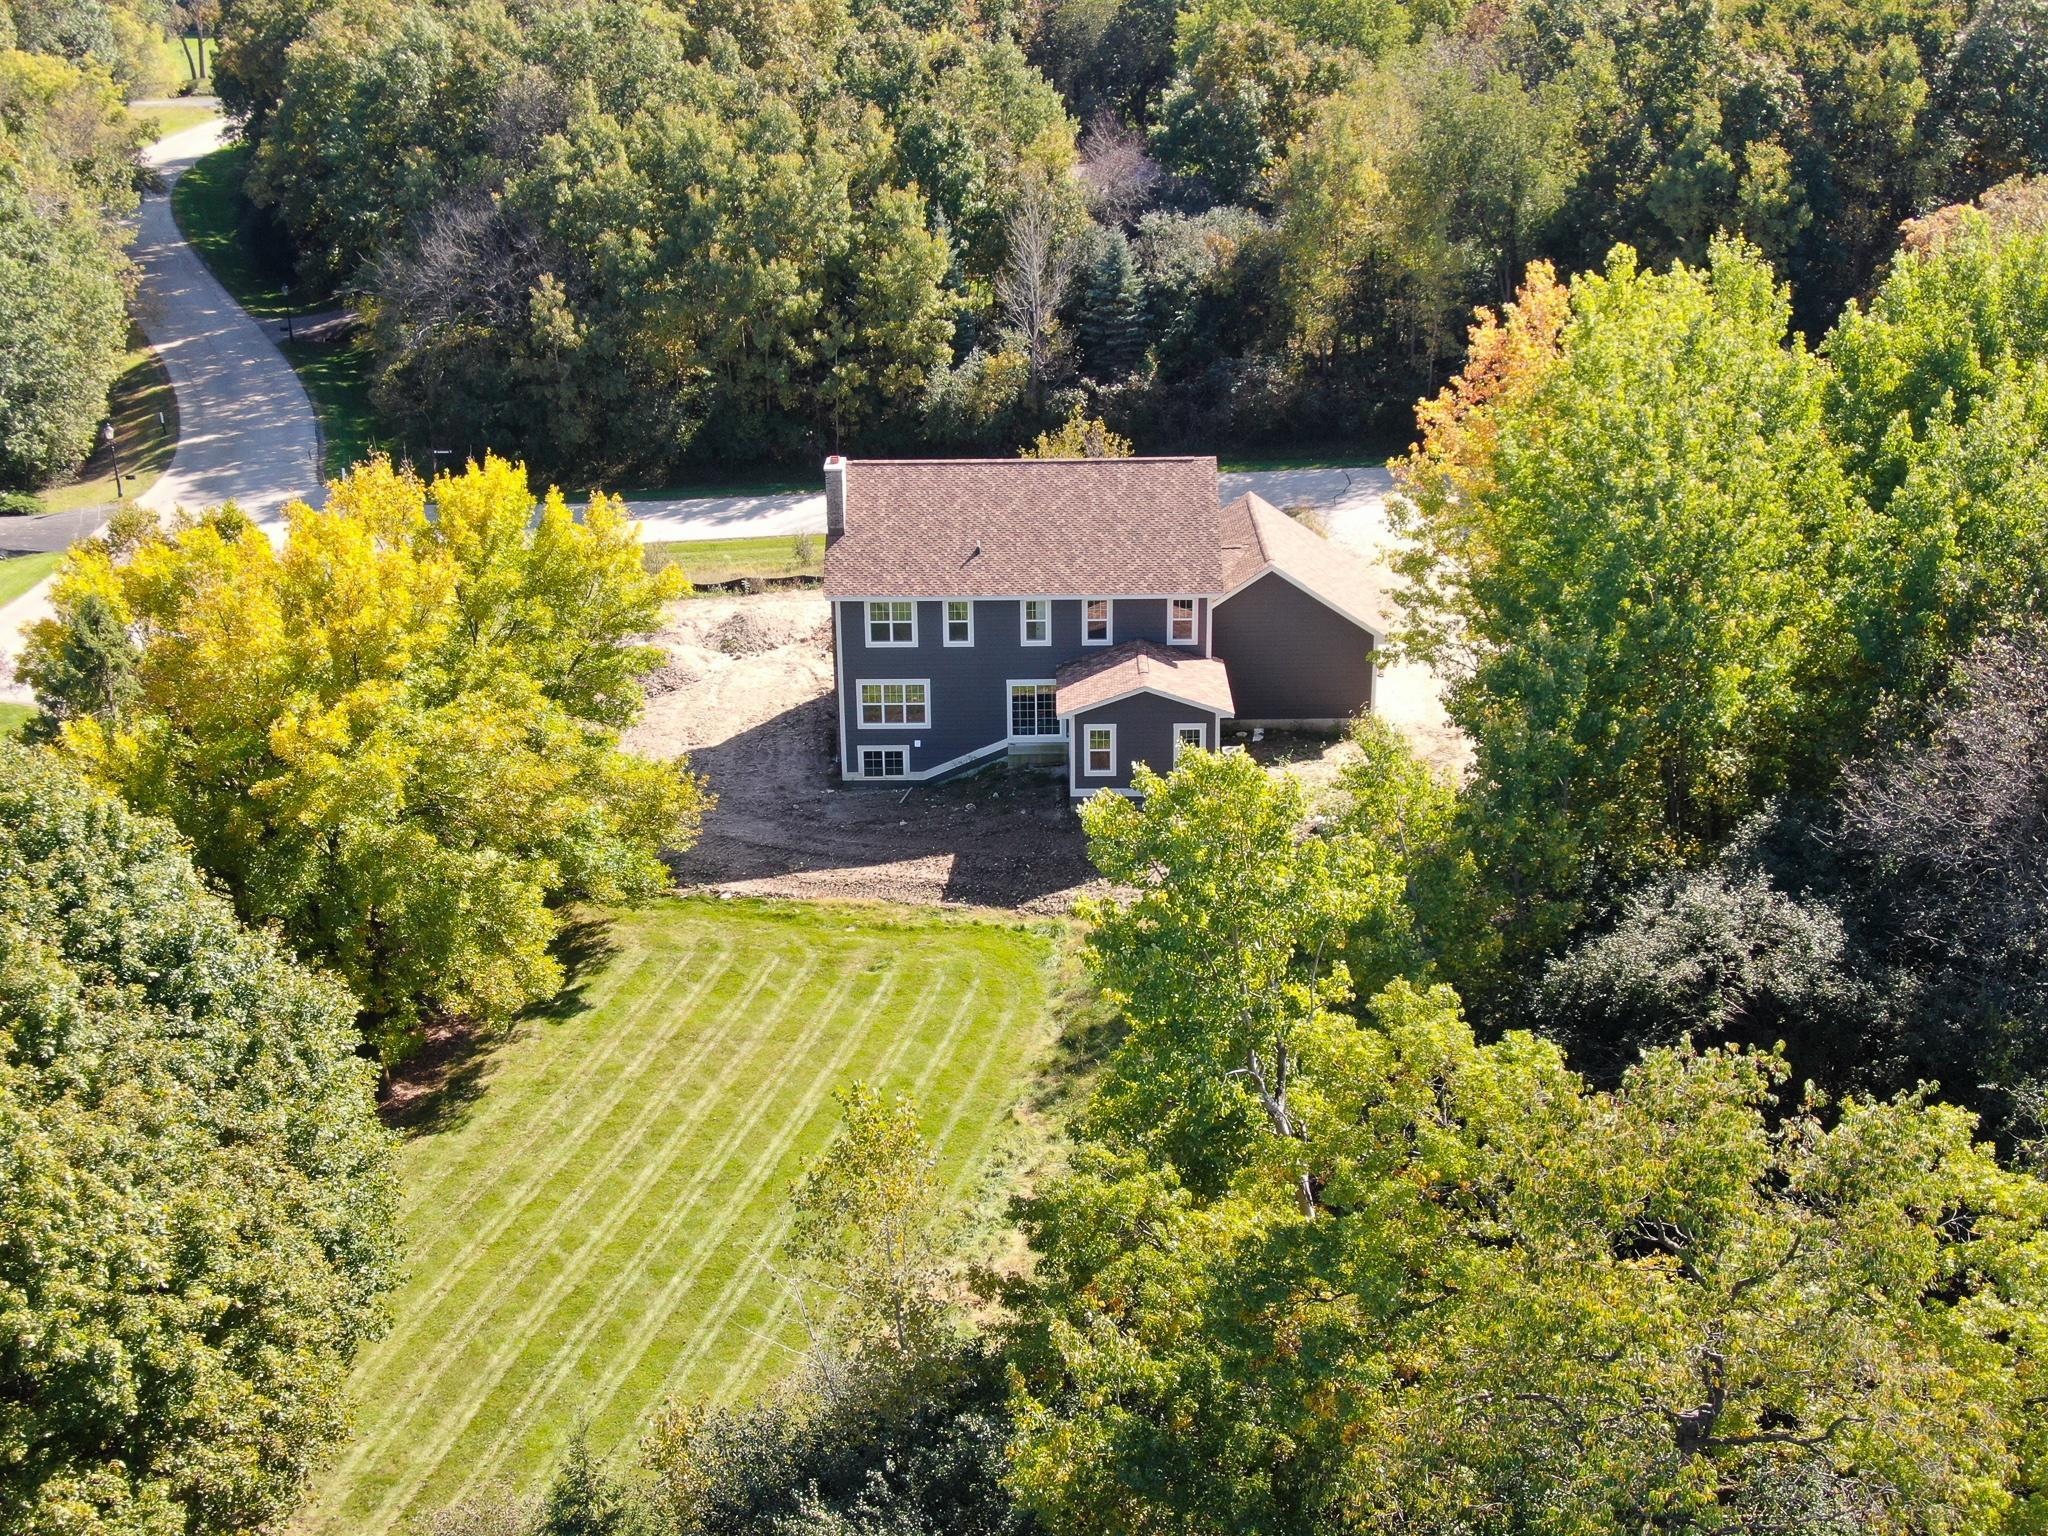 N12W29872 Southhampton Ct, Delafield, Wisconsin 53188, 4 Bedrooms Bedrooms, 9 Rooms Rooms,2 BathroomsBathrooms,Single-Family,For Sale,Southhampton Ct,1667430